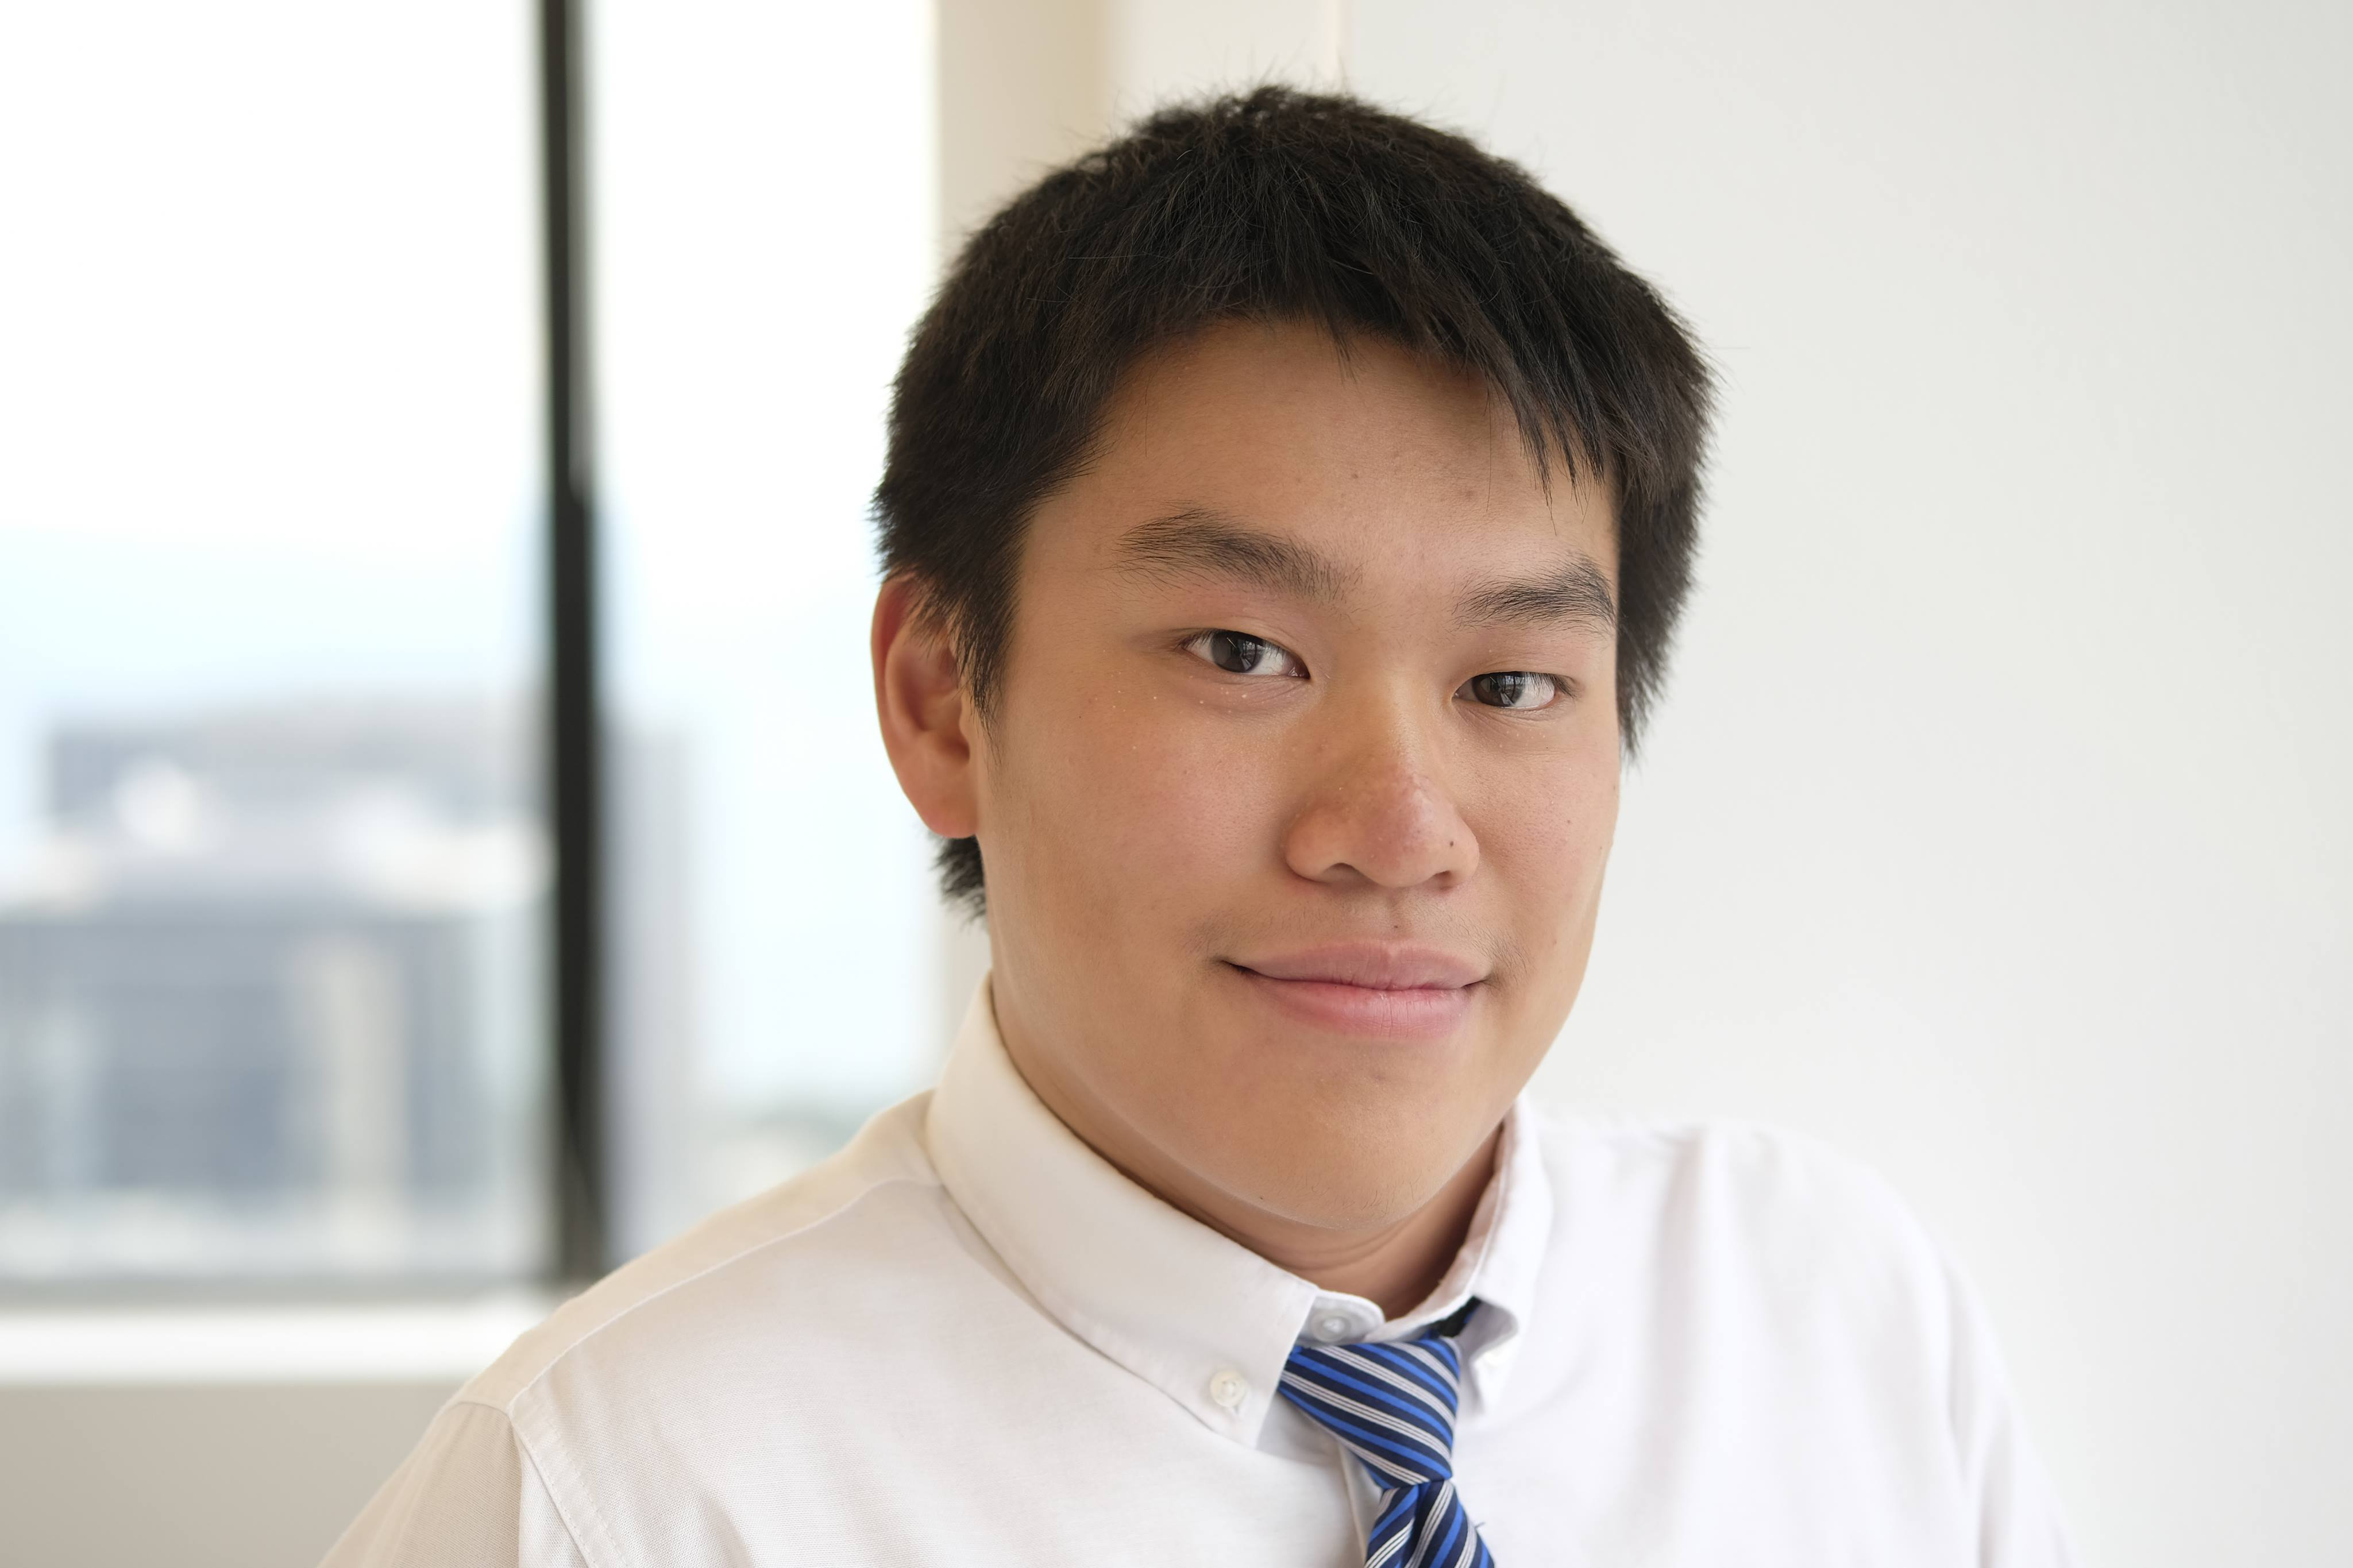 Hongjie Jiang selected for Special Scholarship